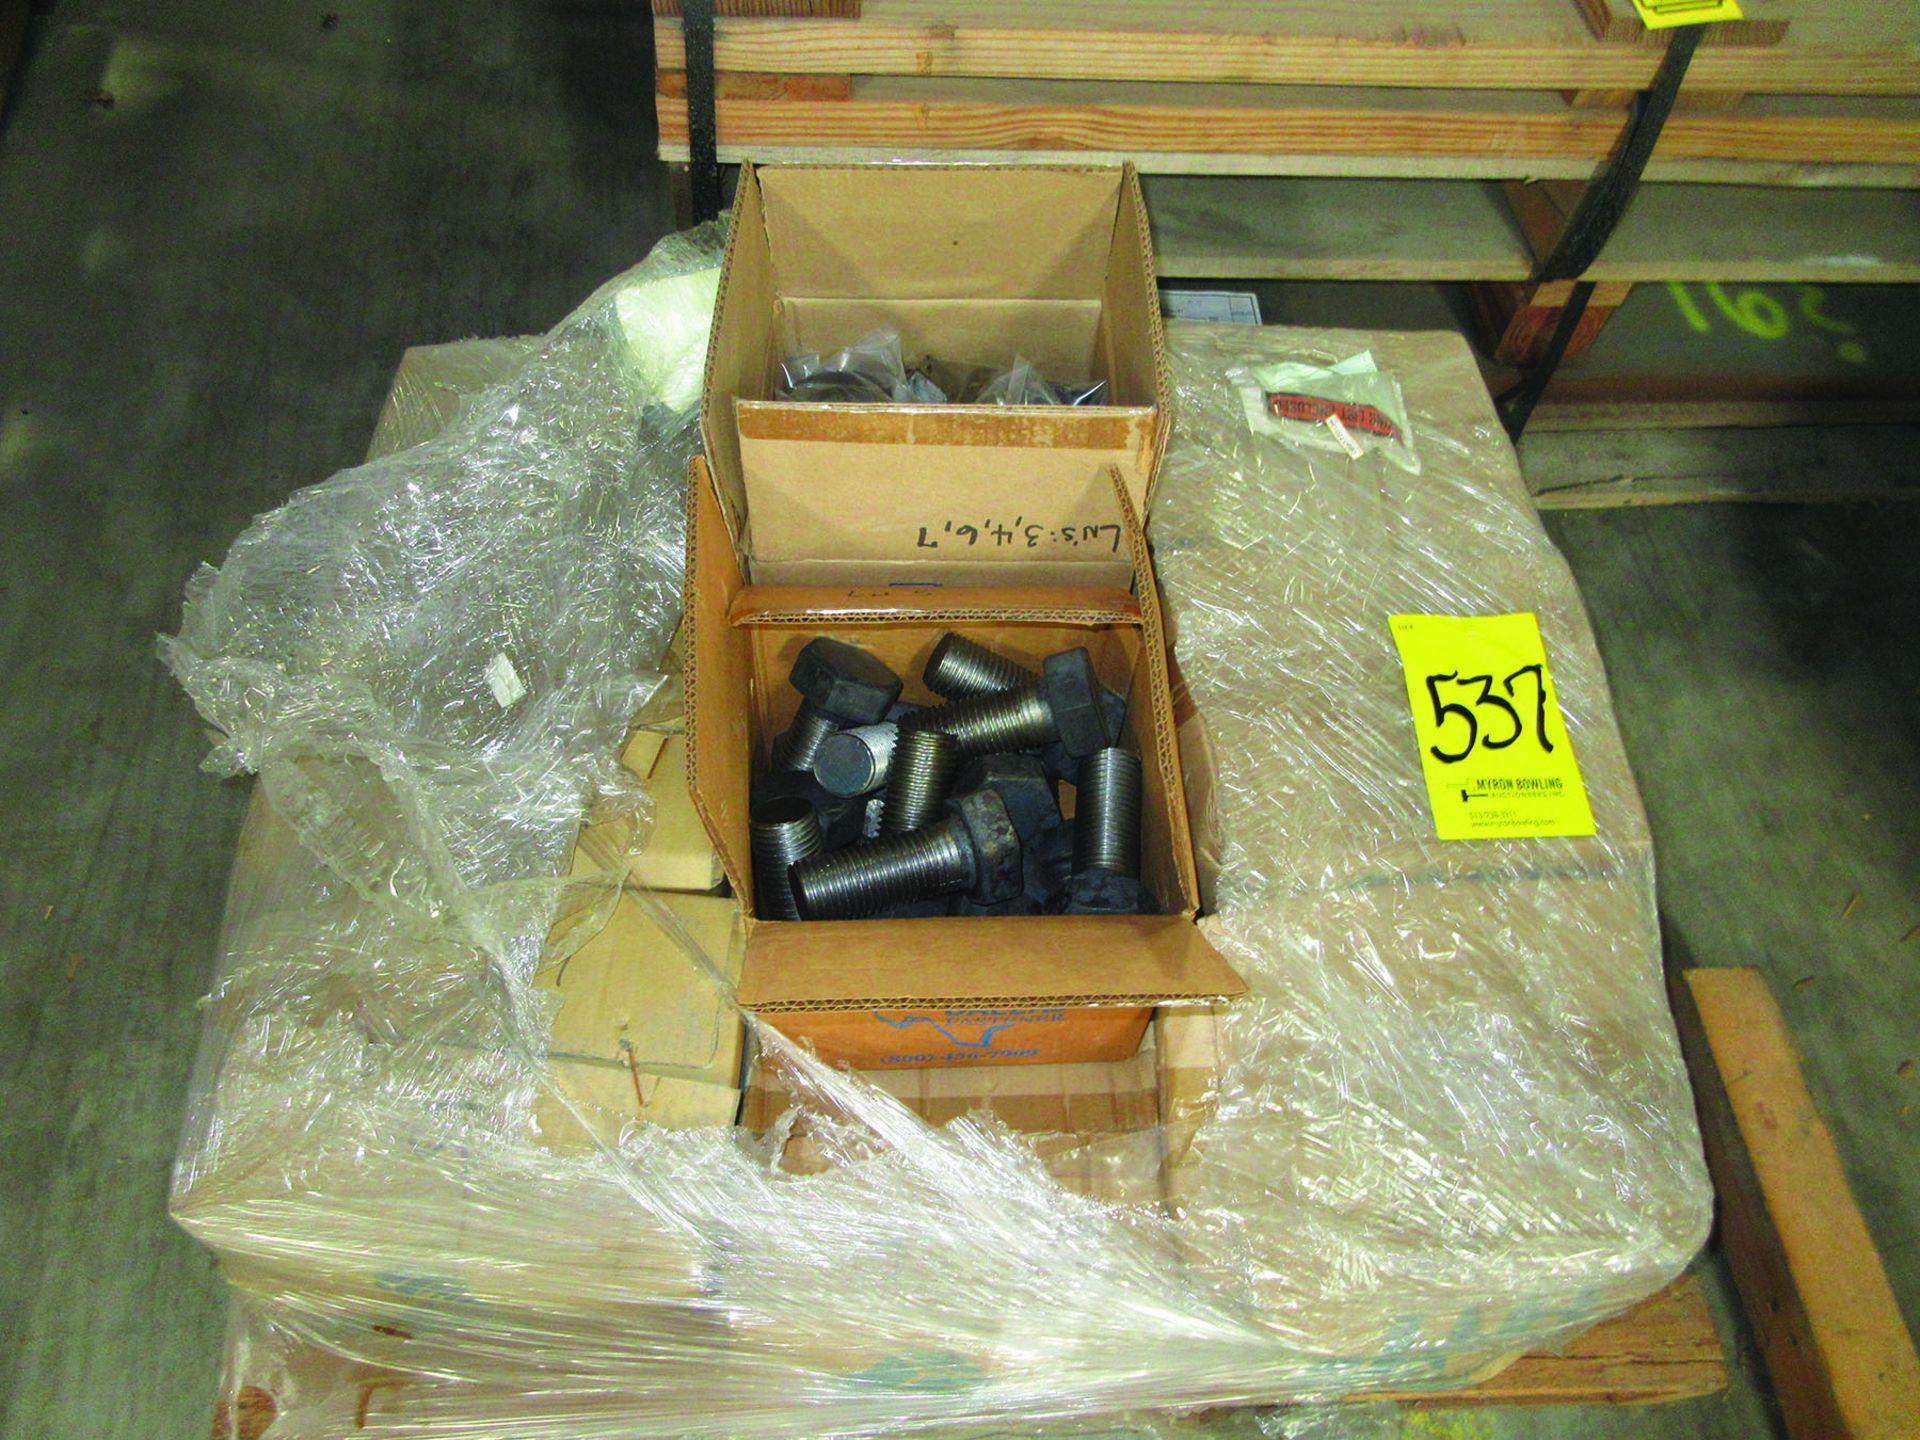 (8) NITROGEN FILLED RADIATORS, 5,000 LB EACH, DIMENSIONS 200'' X 80'' X 26'', (5) EXPANSION - Image 7 of 7